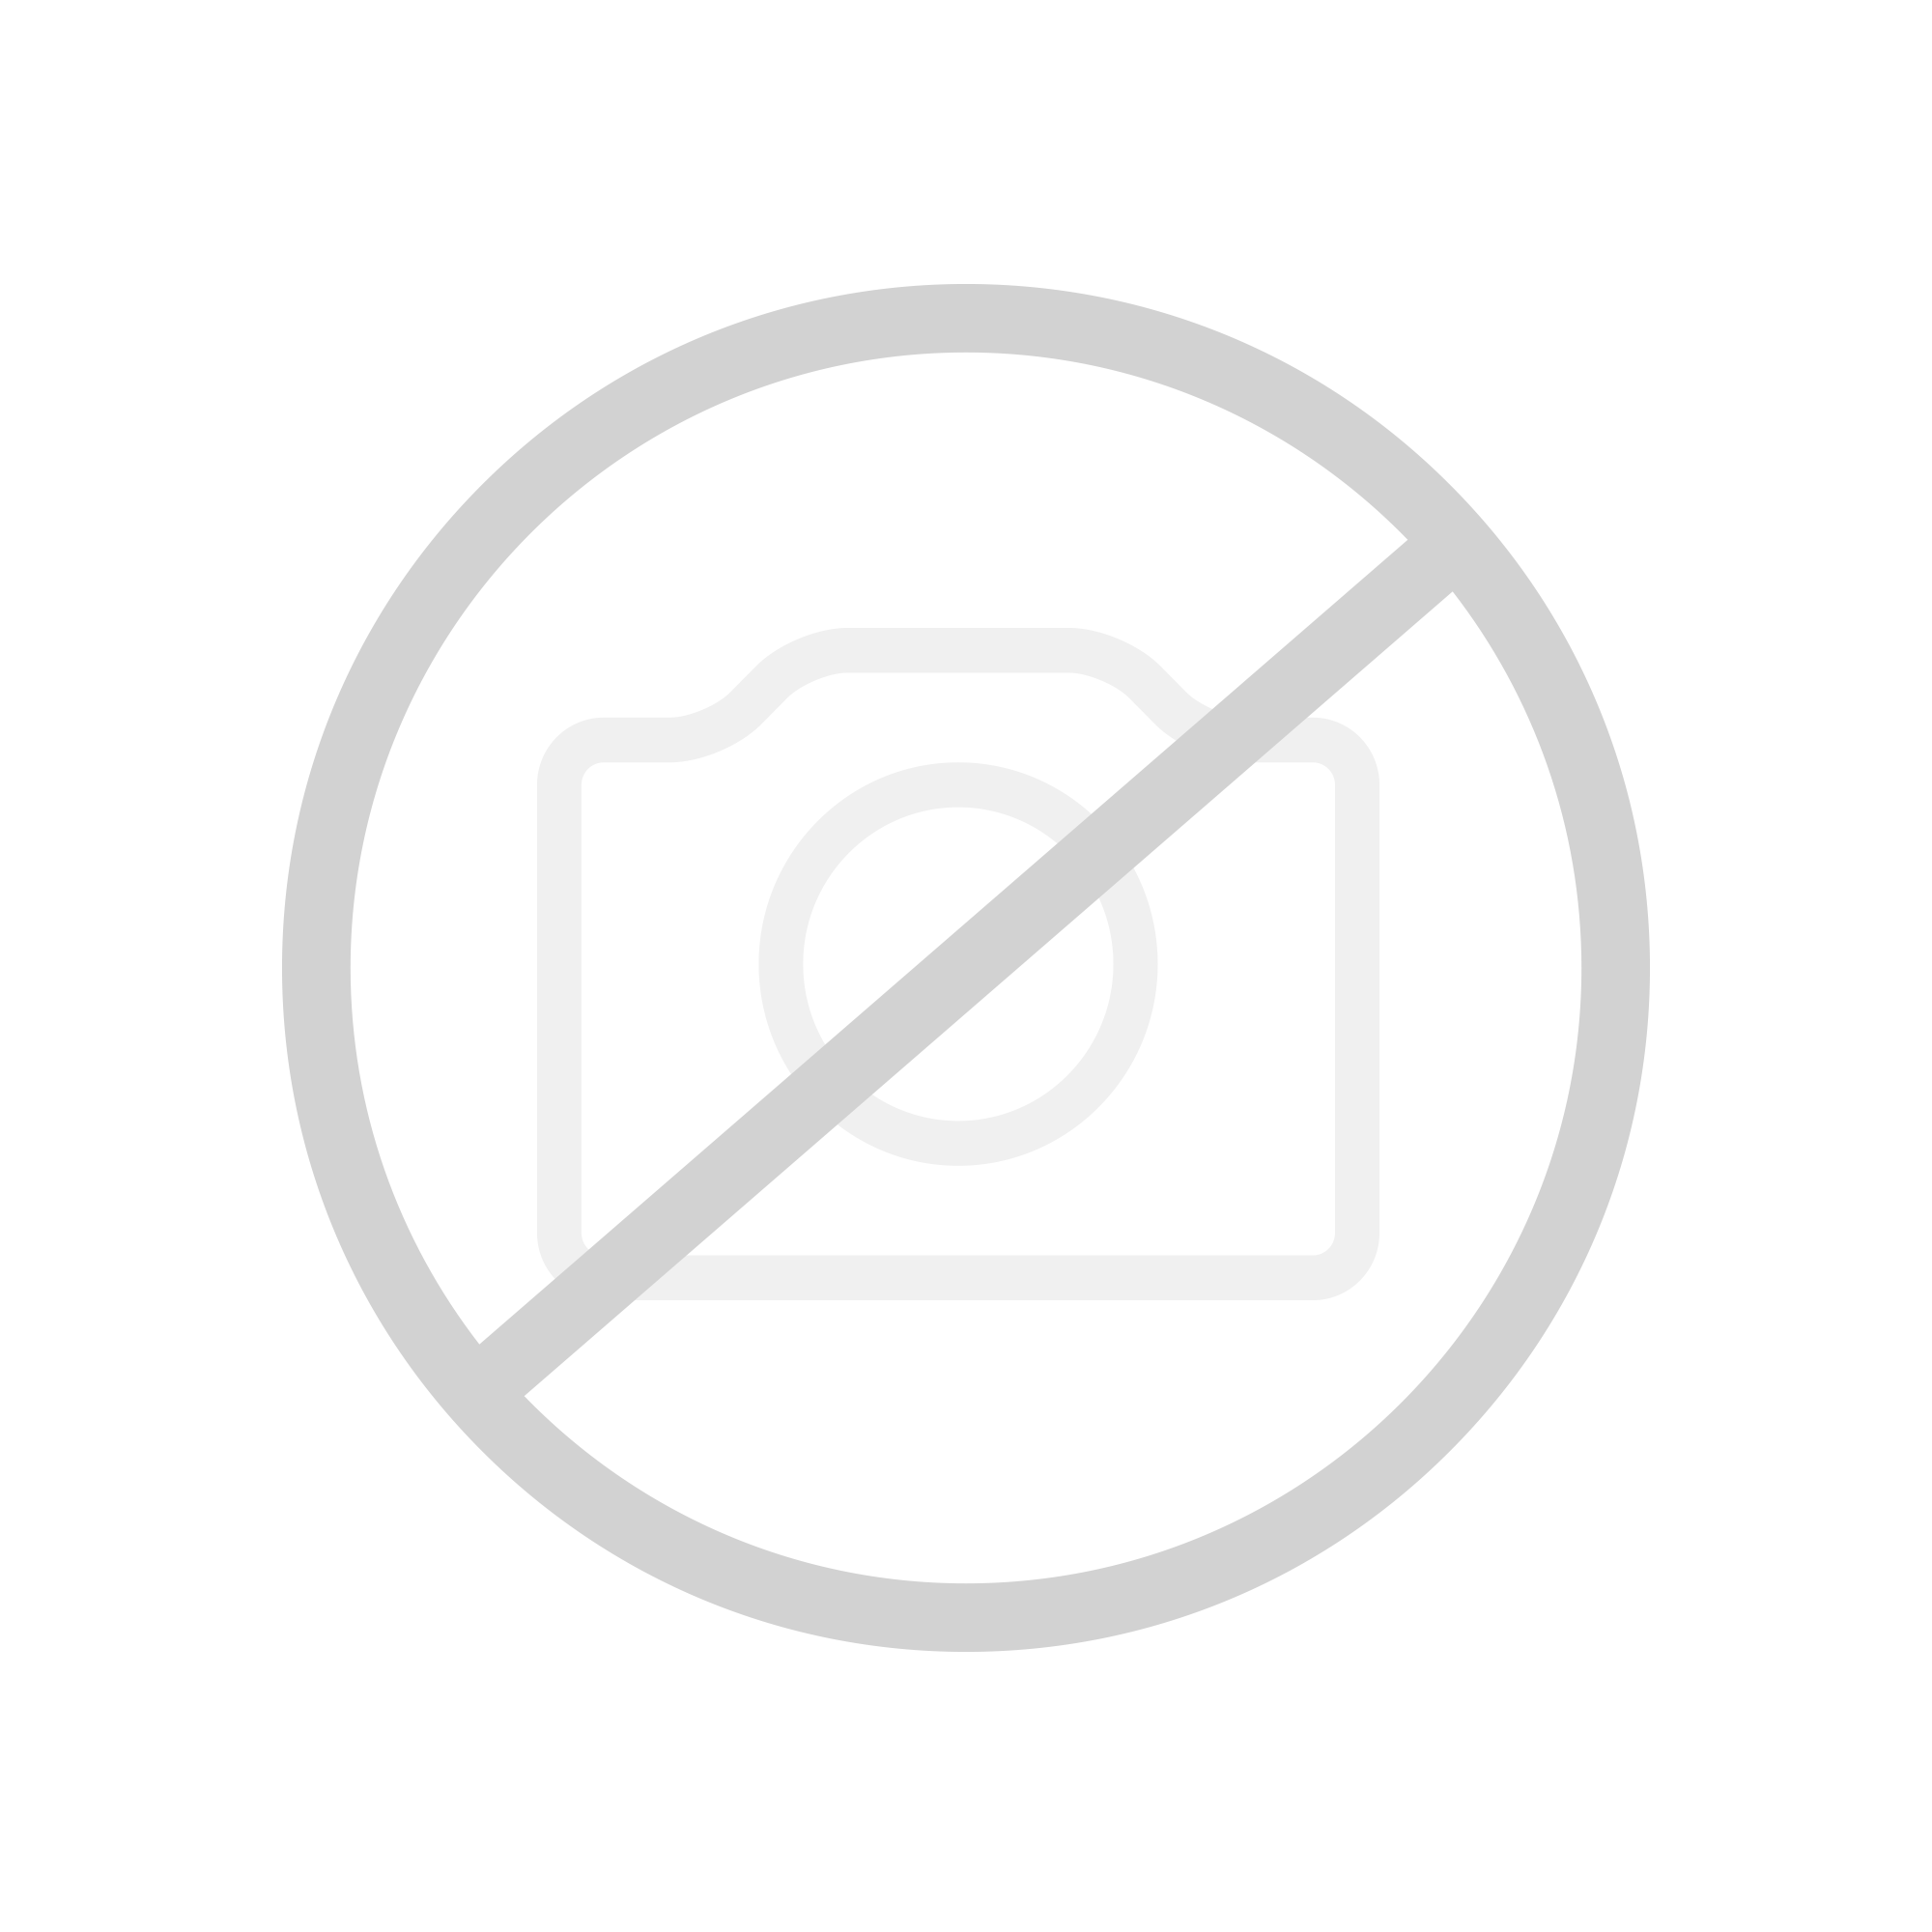 Kaldewei Asymmetric Duo / Conoduo Badewannengriff Typ A